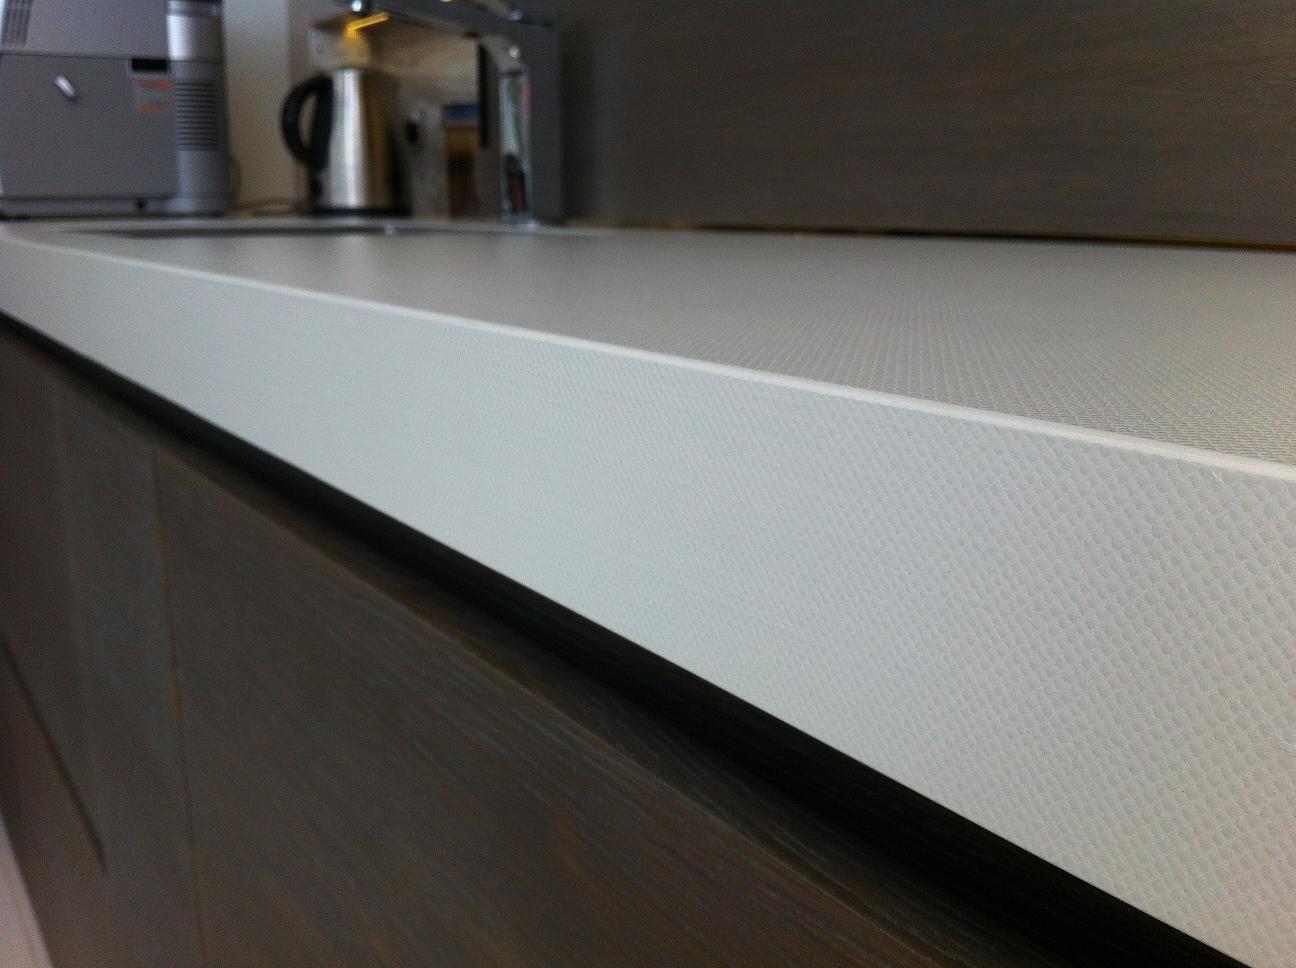 Laminam thin ceramic tiles for floors walls and exteriors laminam thin ceramic tiles for floors walls and exteriors dailygadgetfo Images